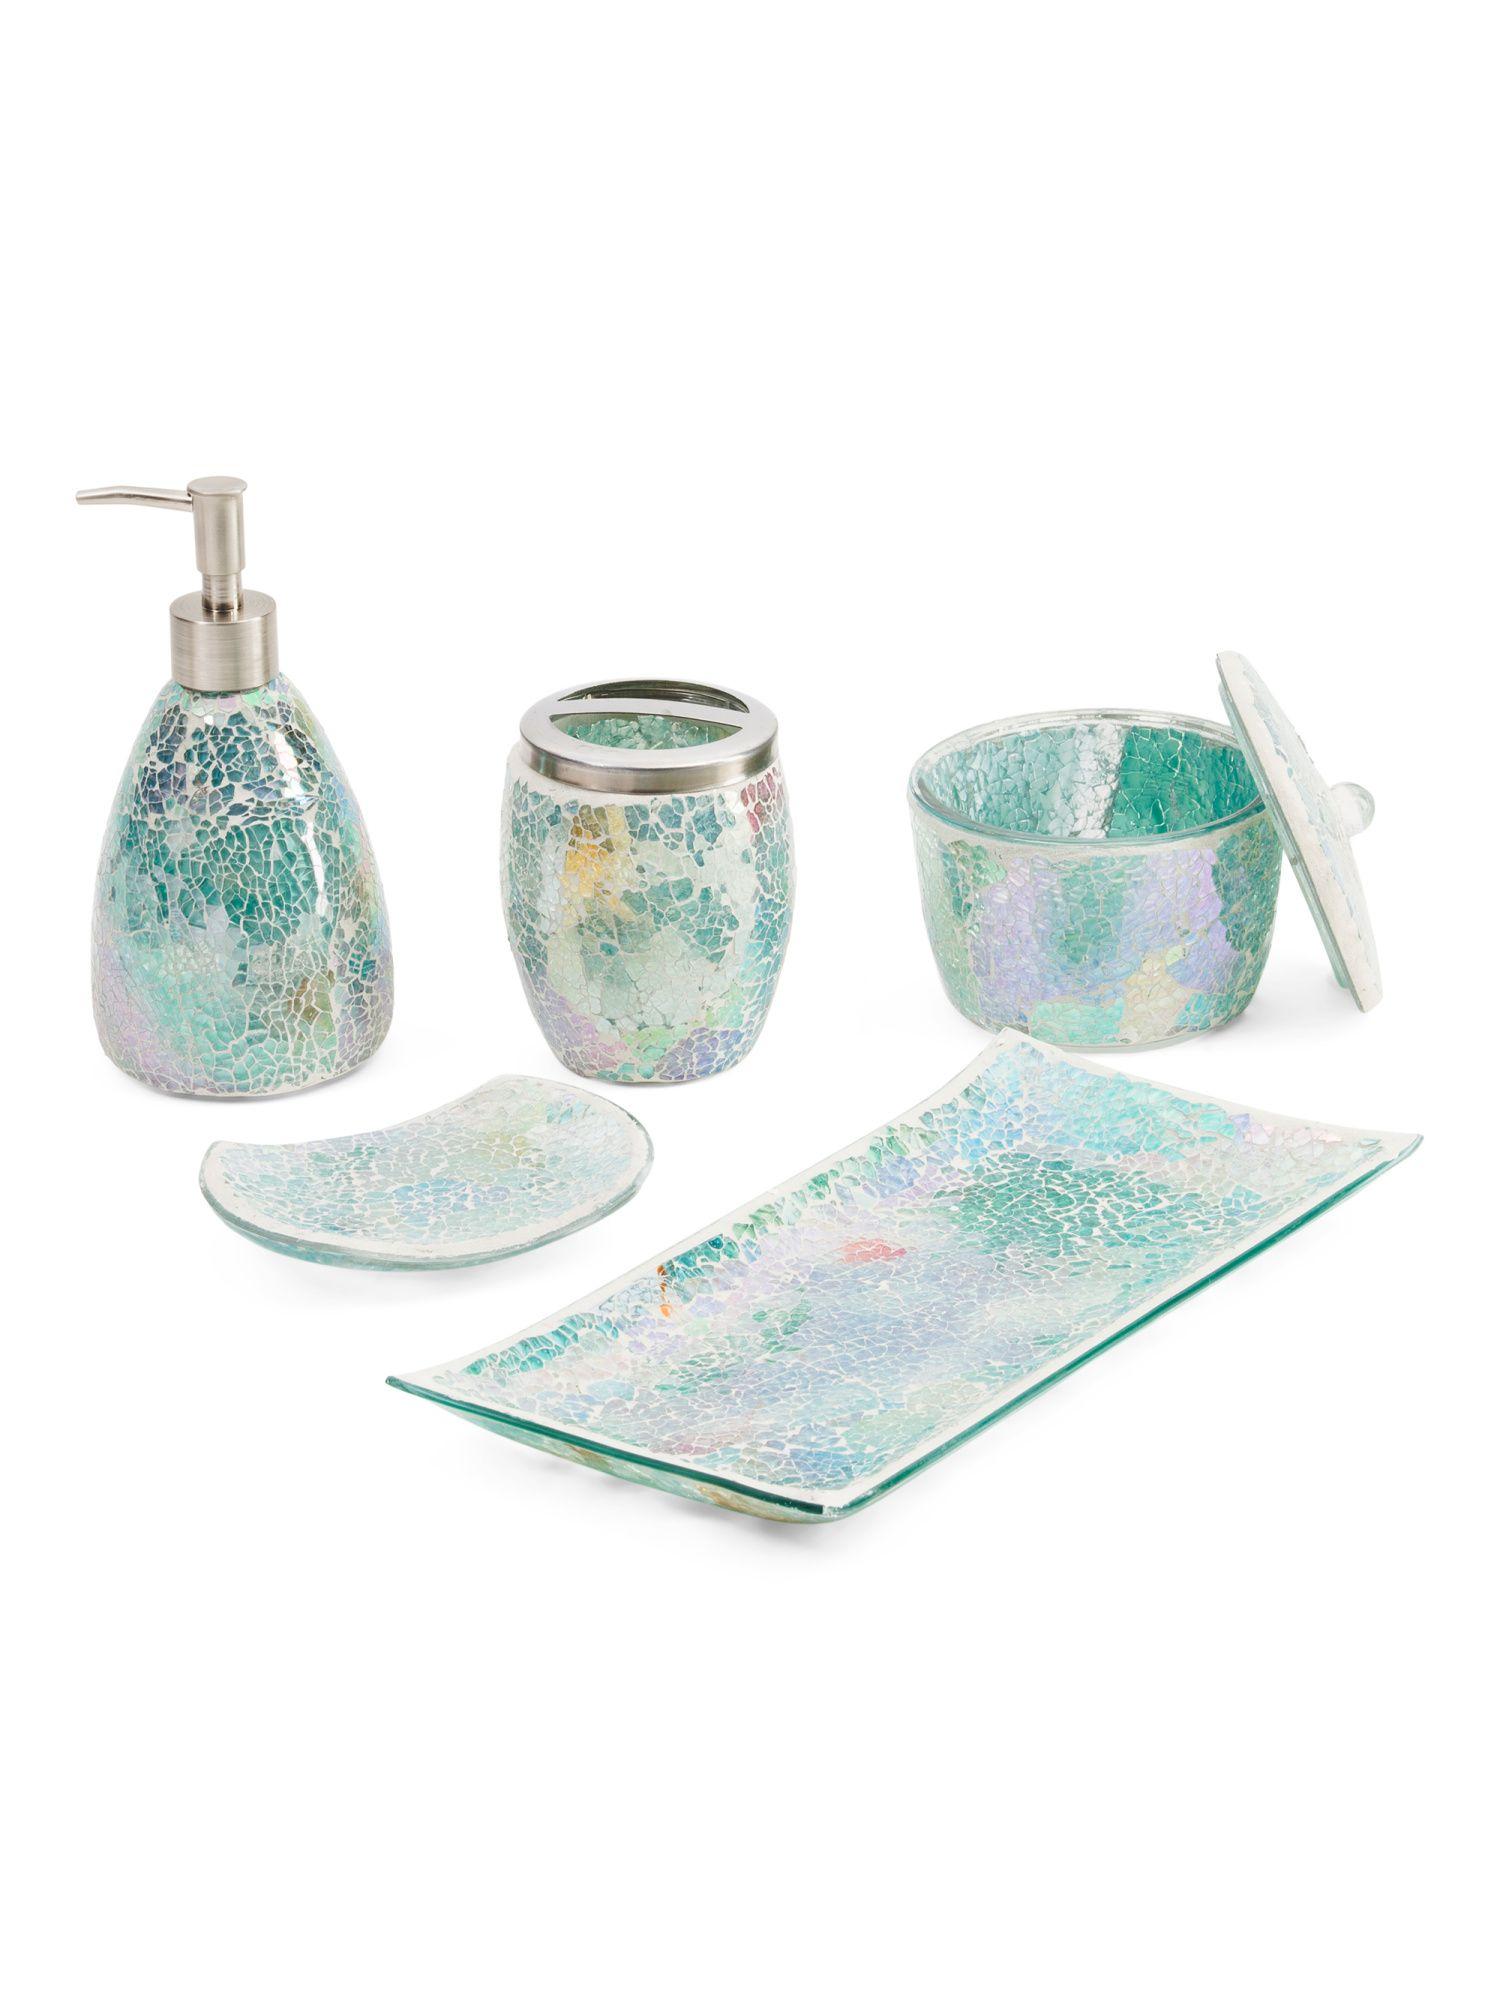 Iridescent 5pc Bathroom Set Bath T J Maxx Bathroom Sets Jar